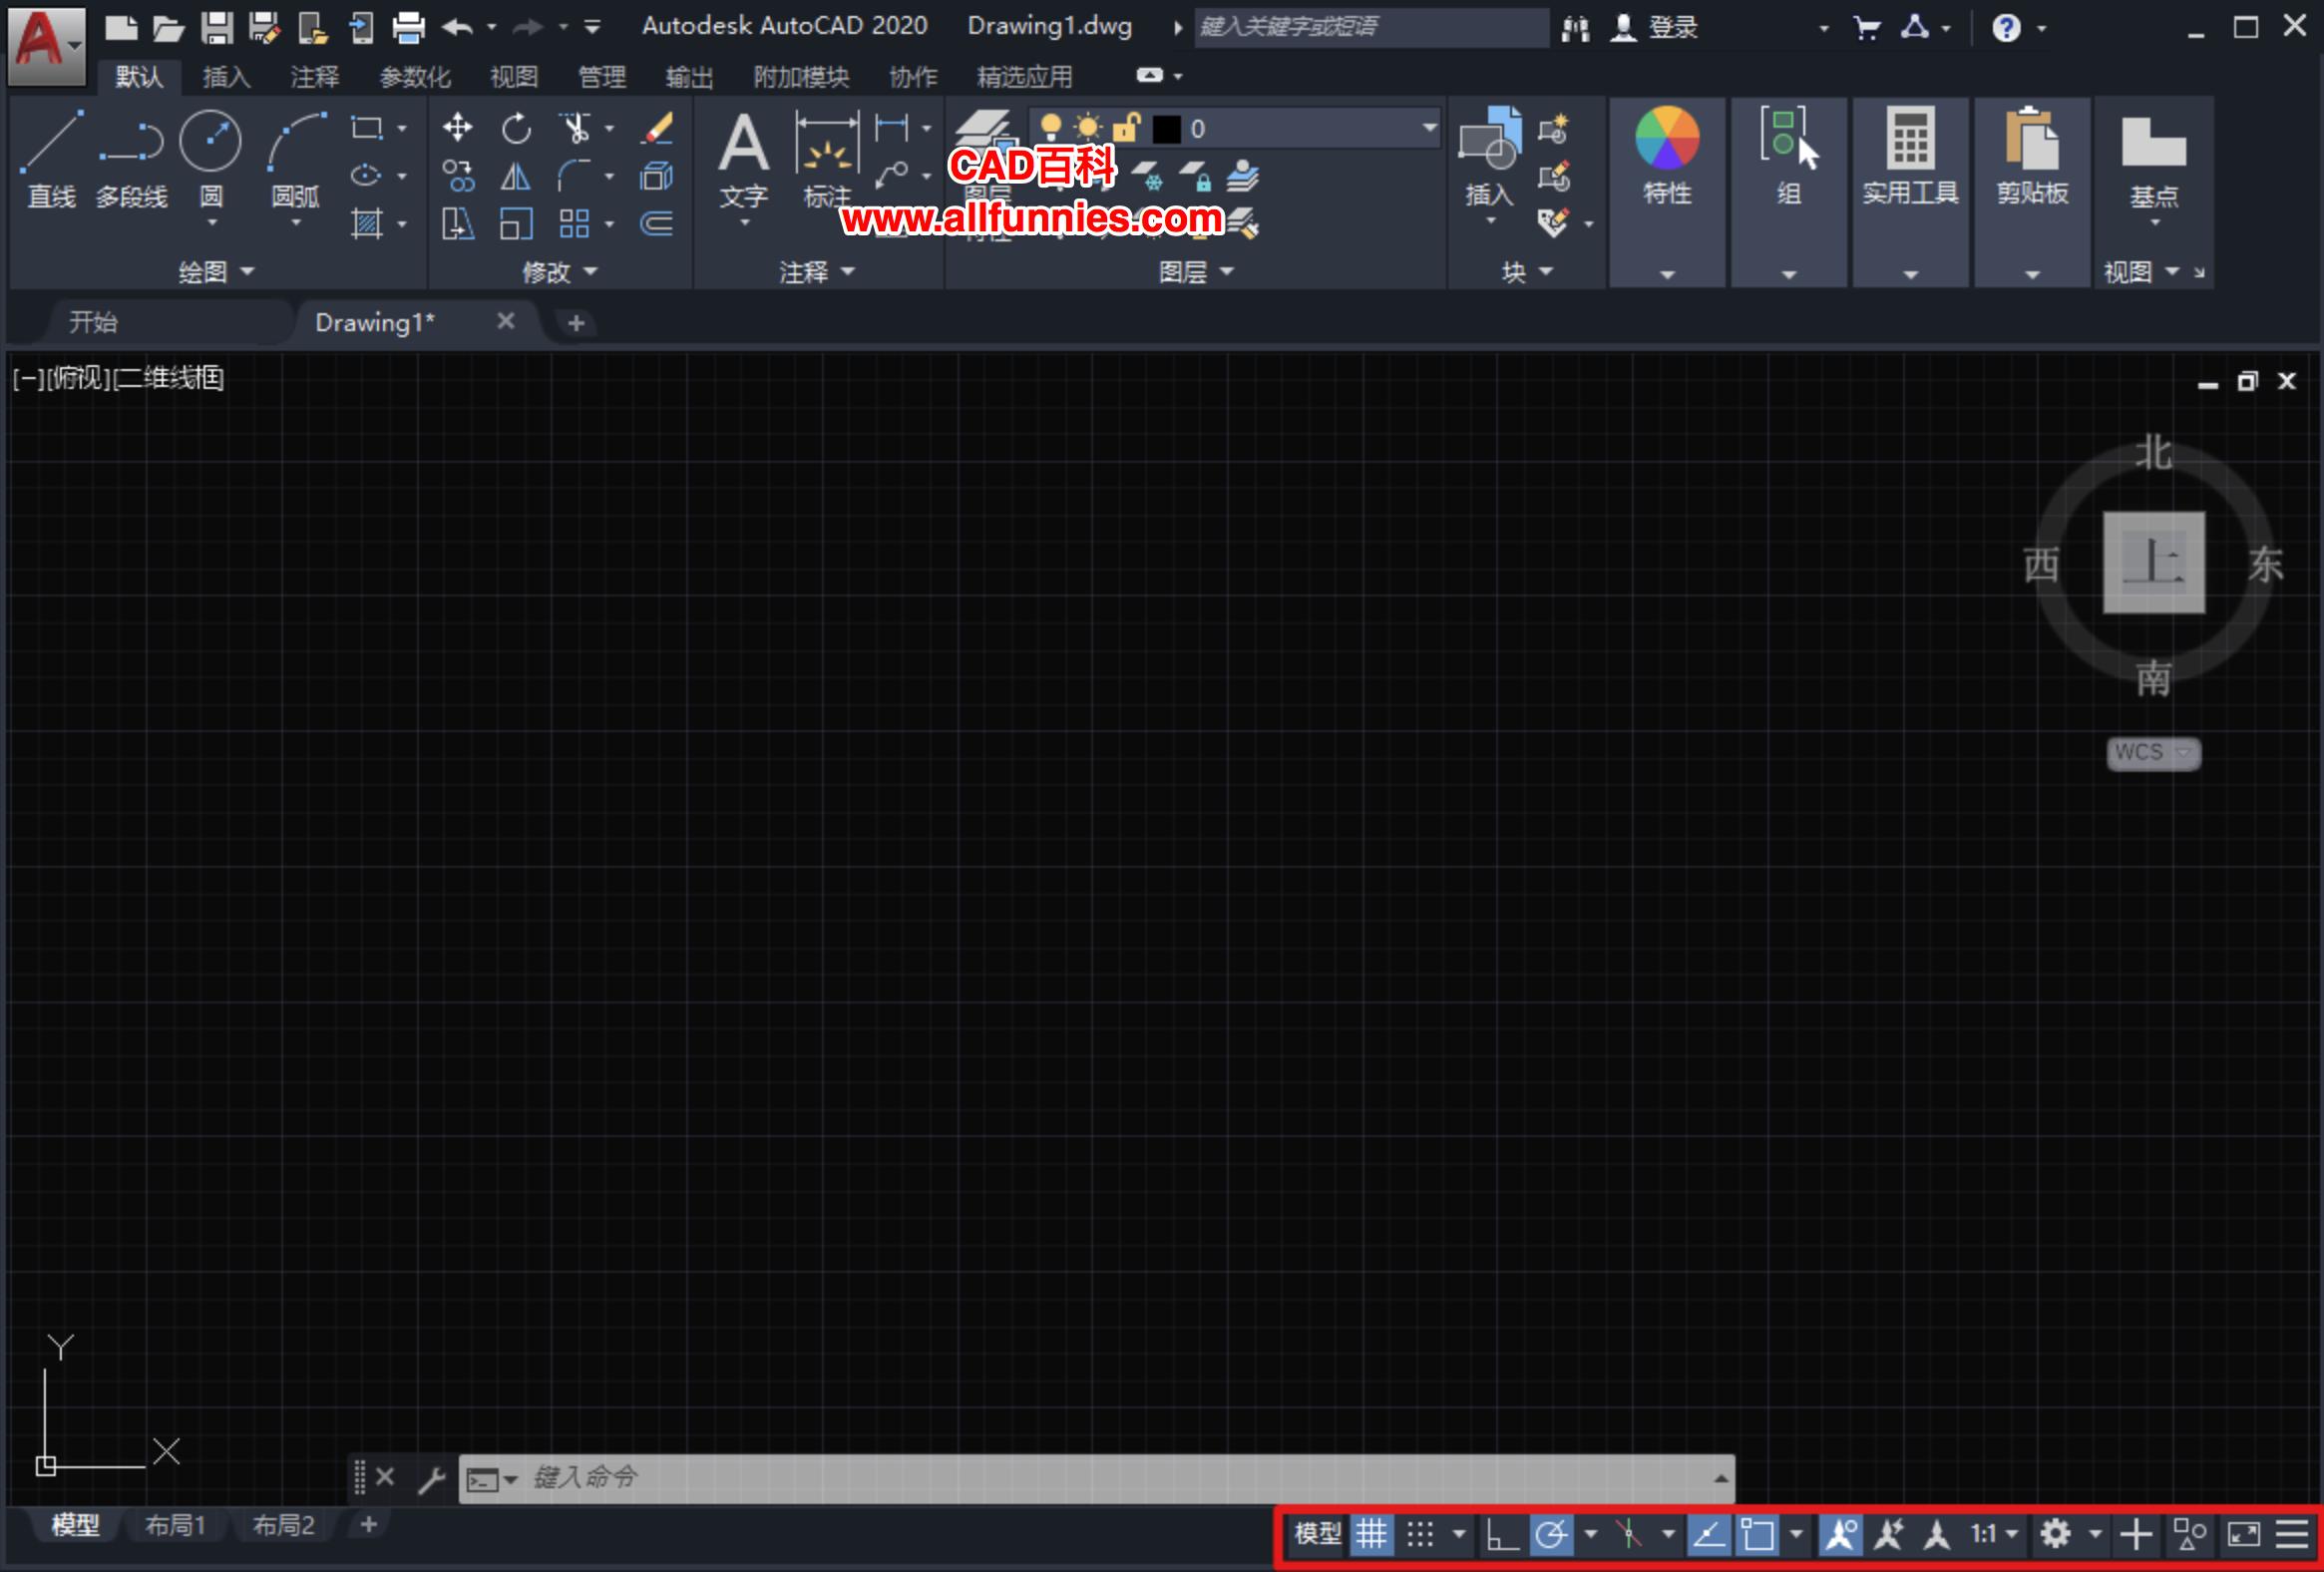 CAD状态栏包含哪些内容(状态栏不见了怎么调出来)